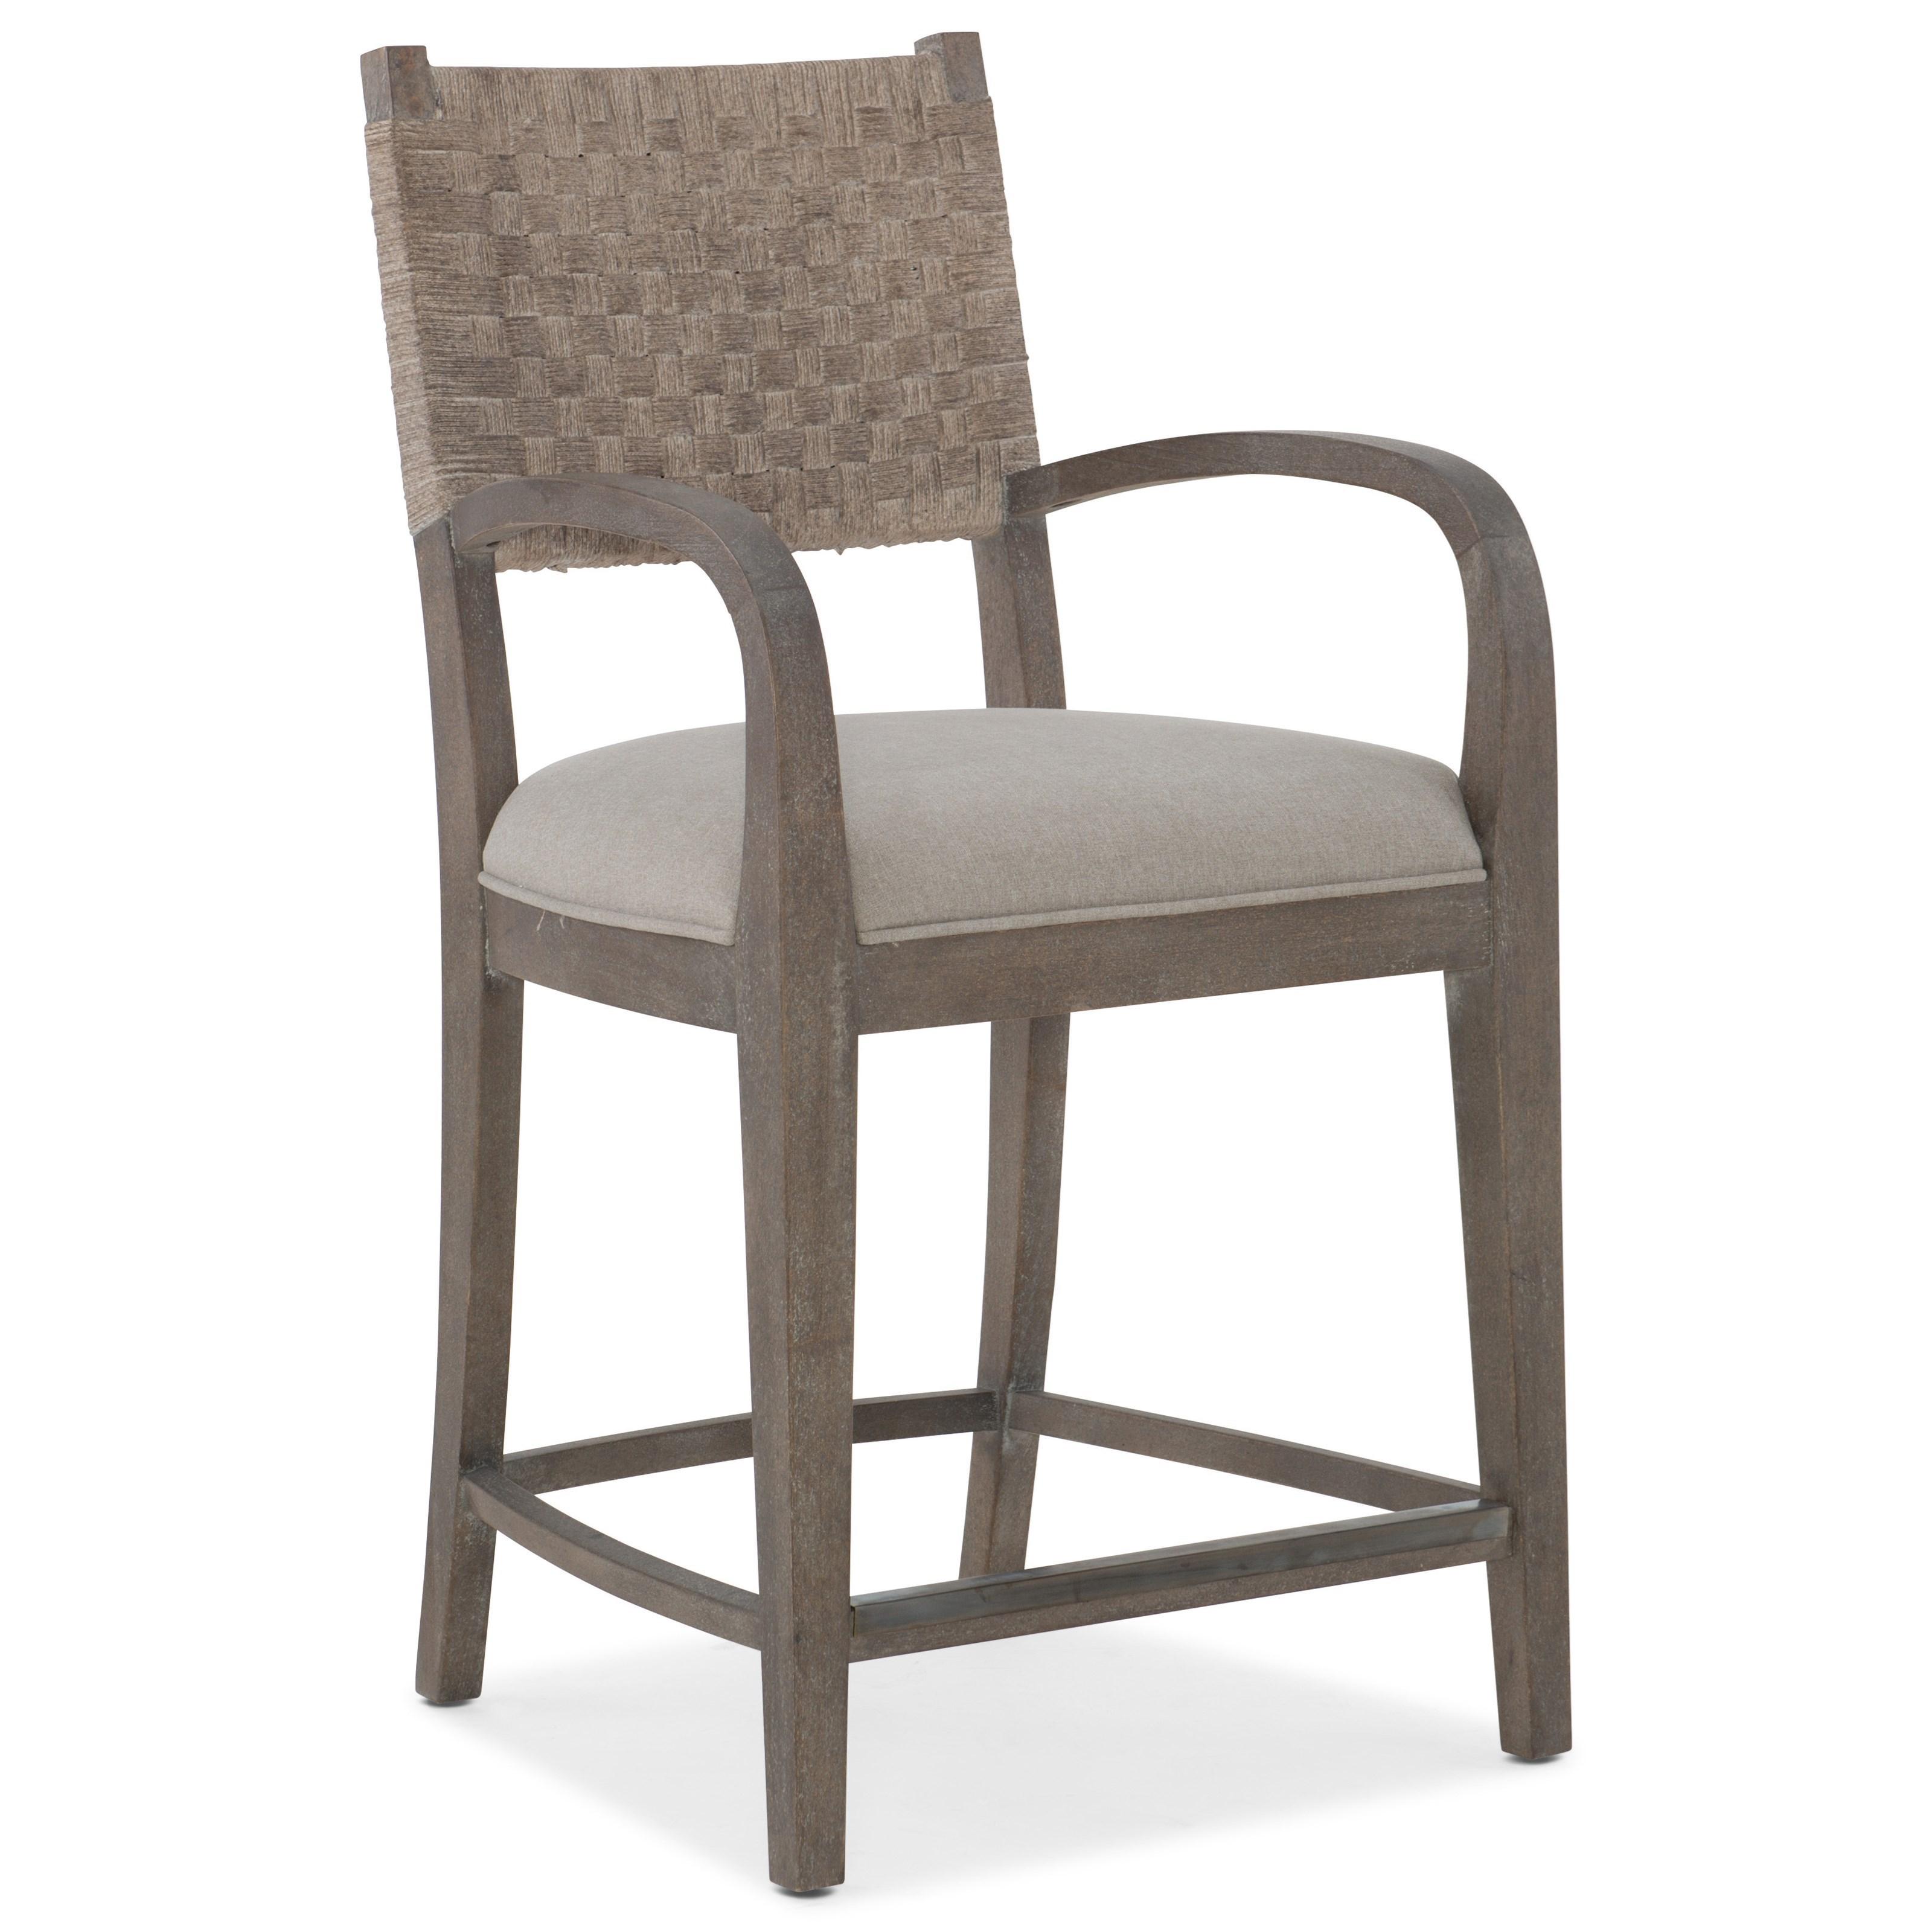 Hooker Furniture Miramar Carmel O Keefe Counter Stool